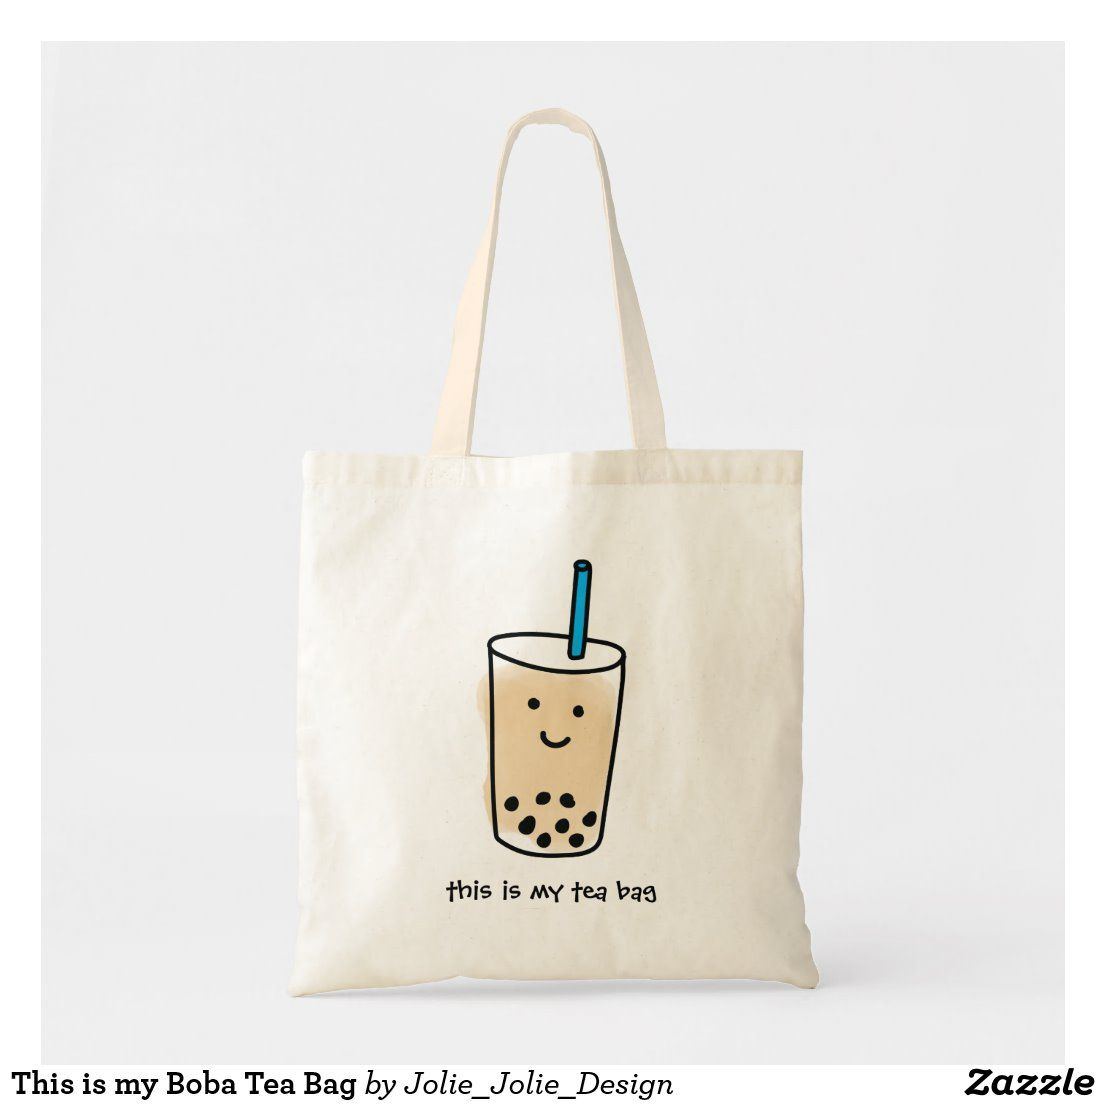 Download This Is My Boba Tea Bag Zazzle Com In 2020 Fashion Tote Bag Design Canvas Bag Design Diy Tote Bag